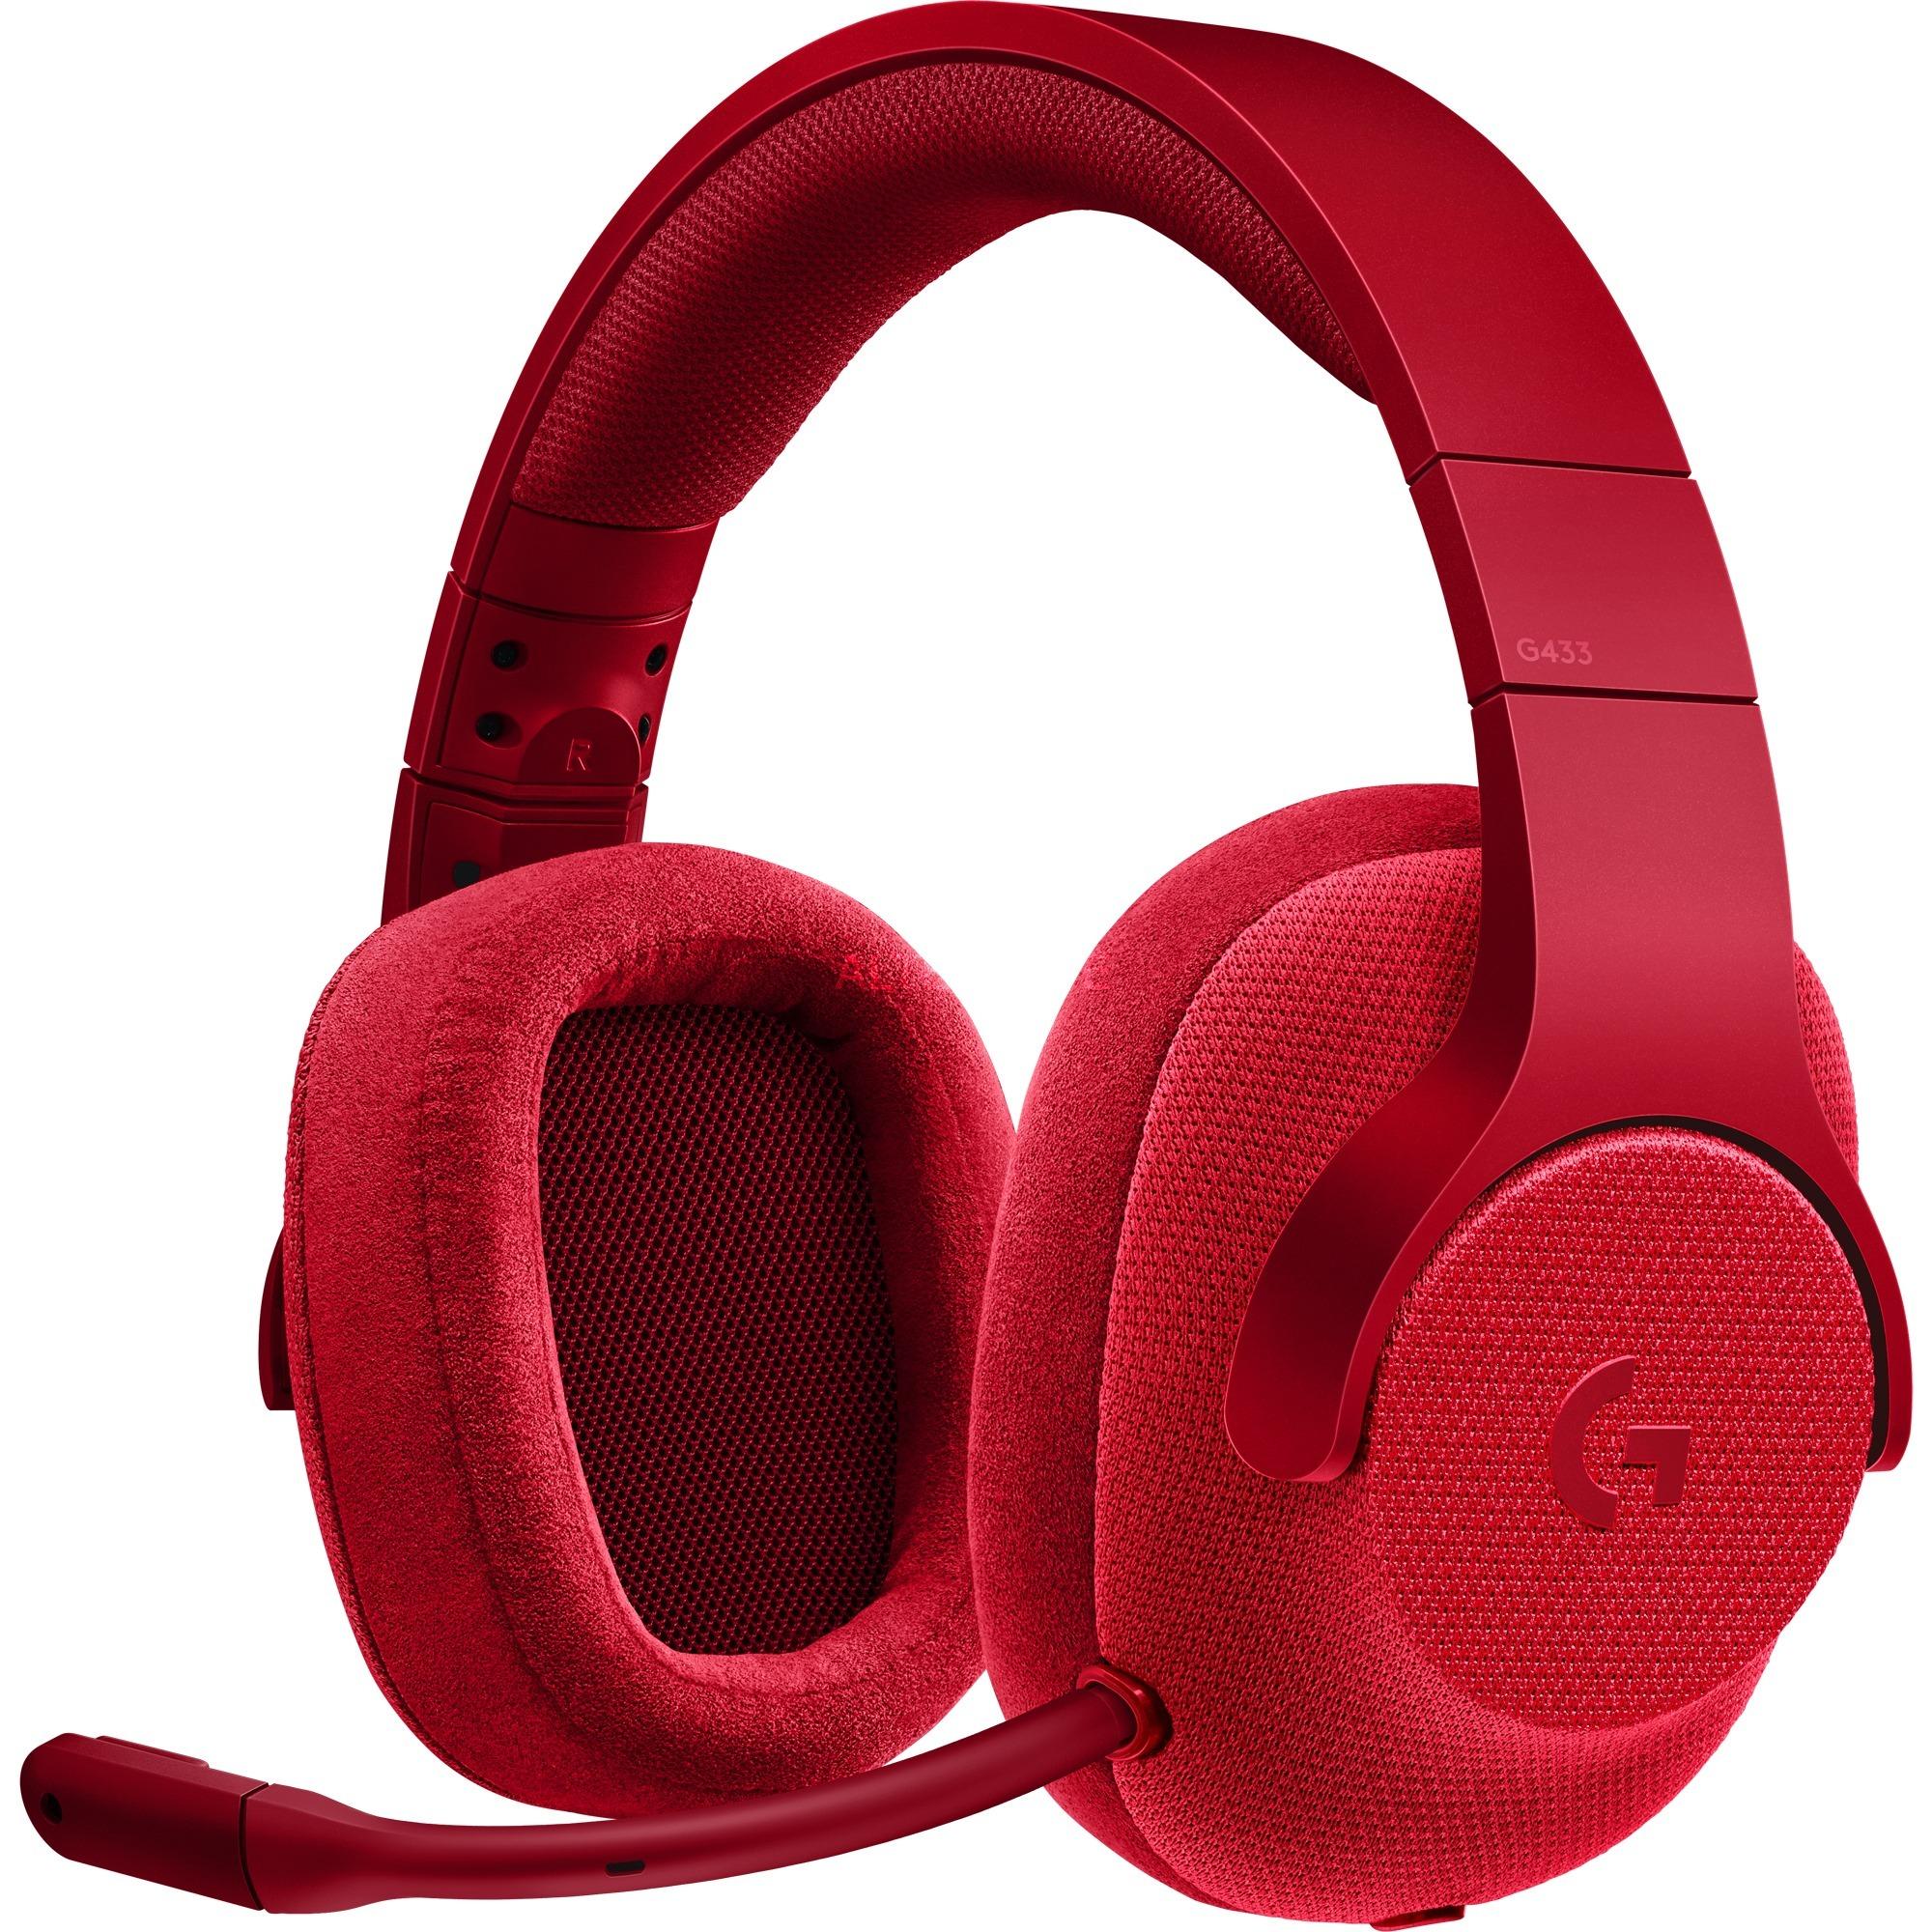 G433 Binaurale Diadema Rojo auricular con micrófono, Auriculares con micrófono